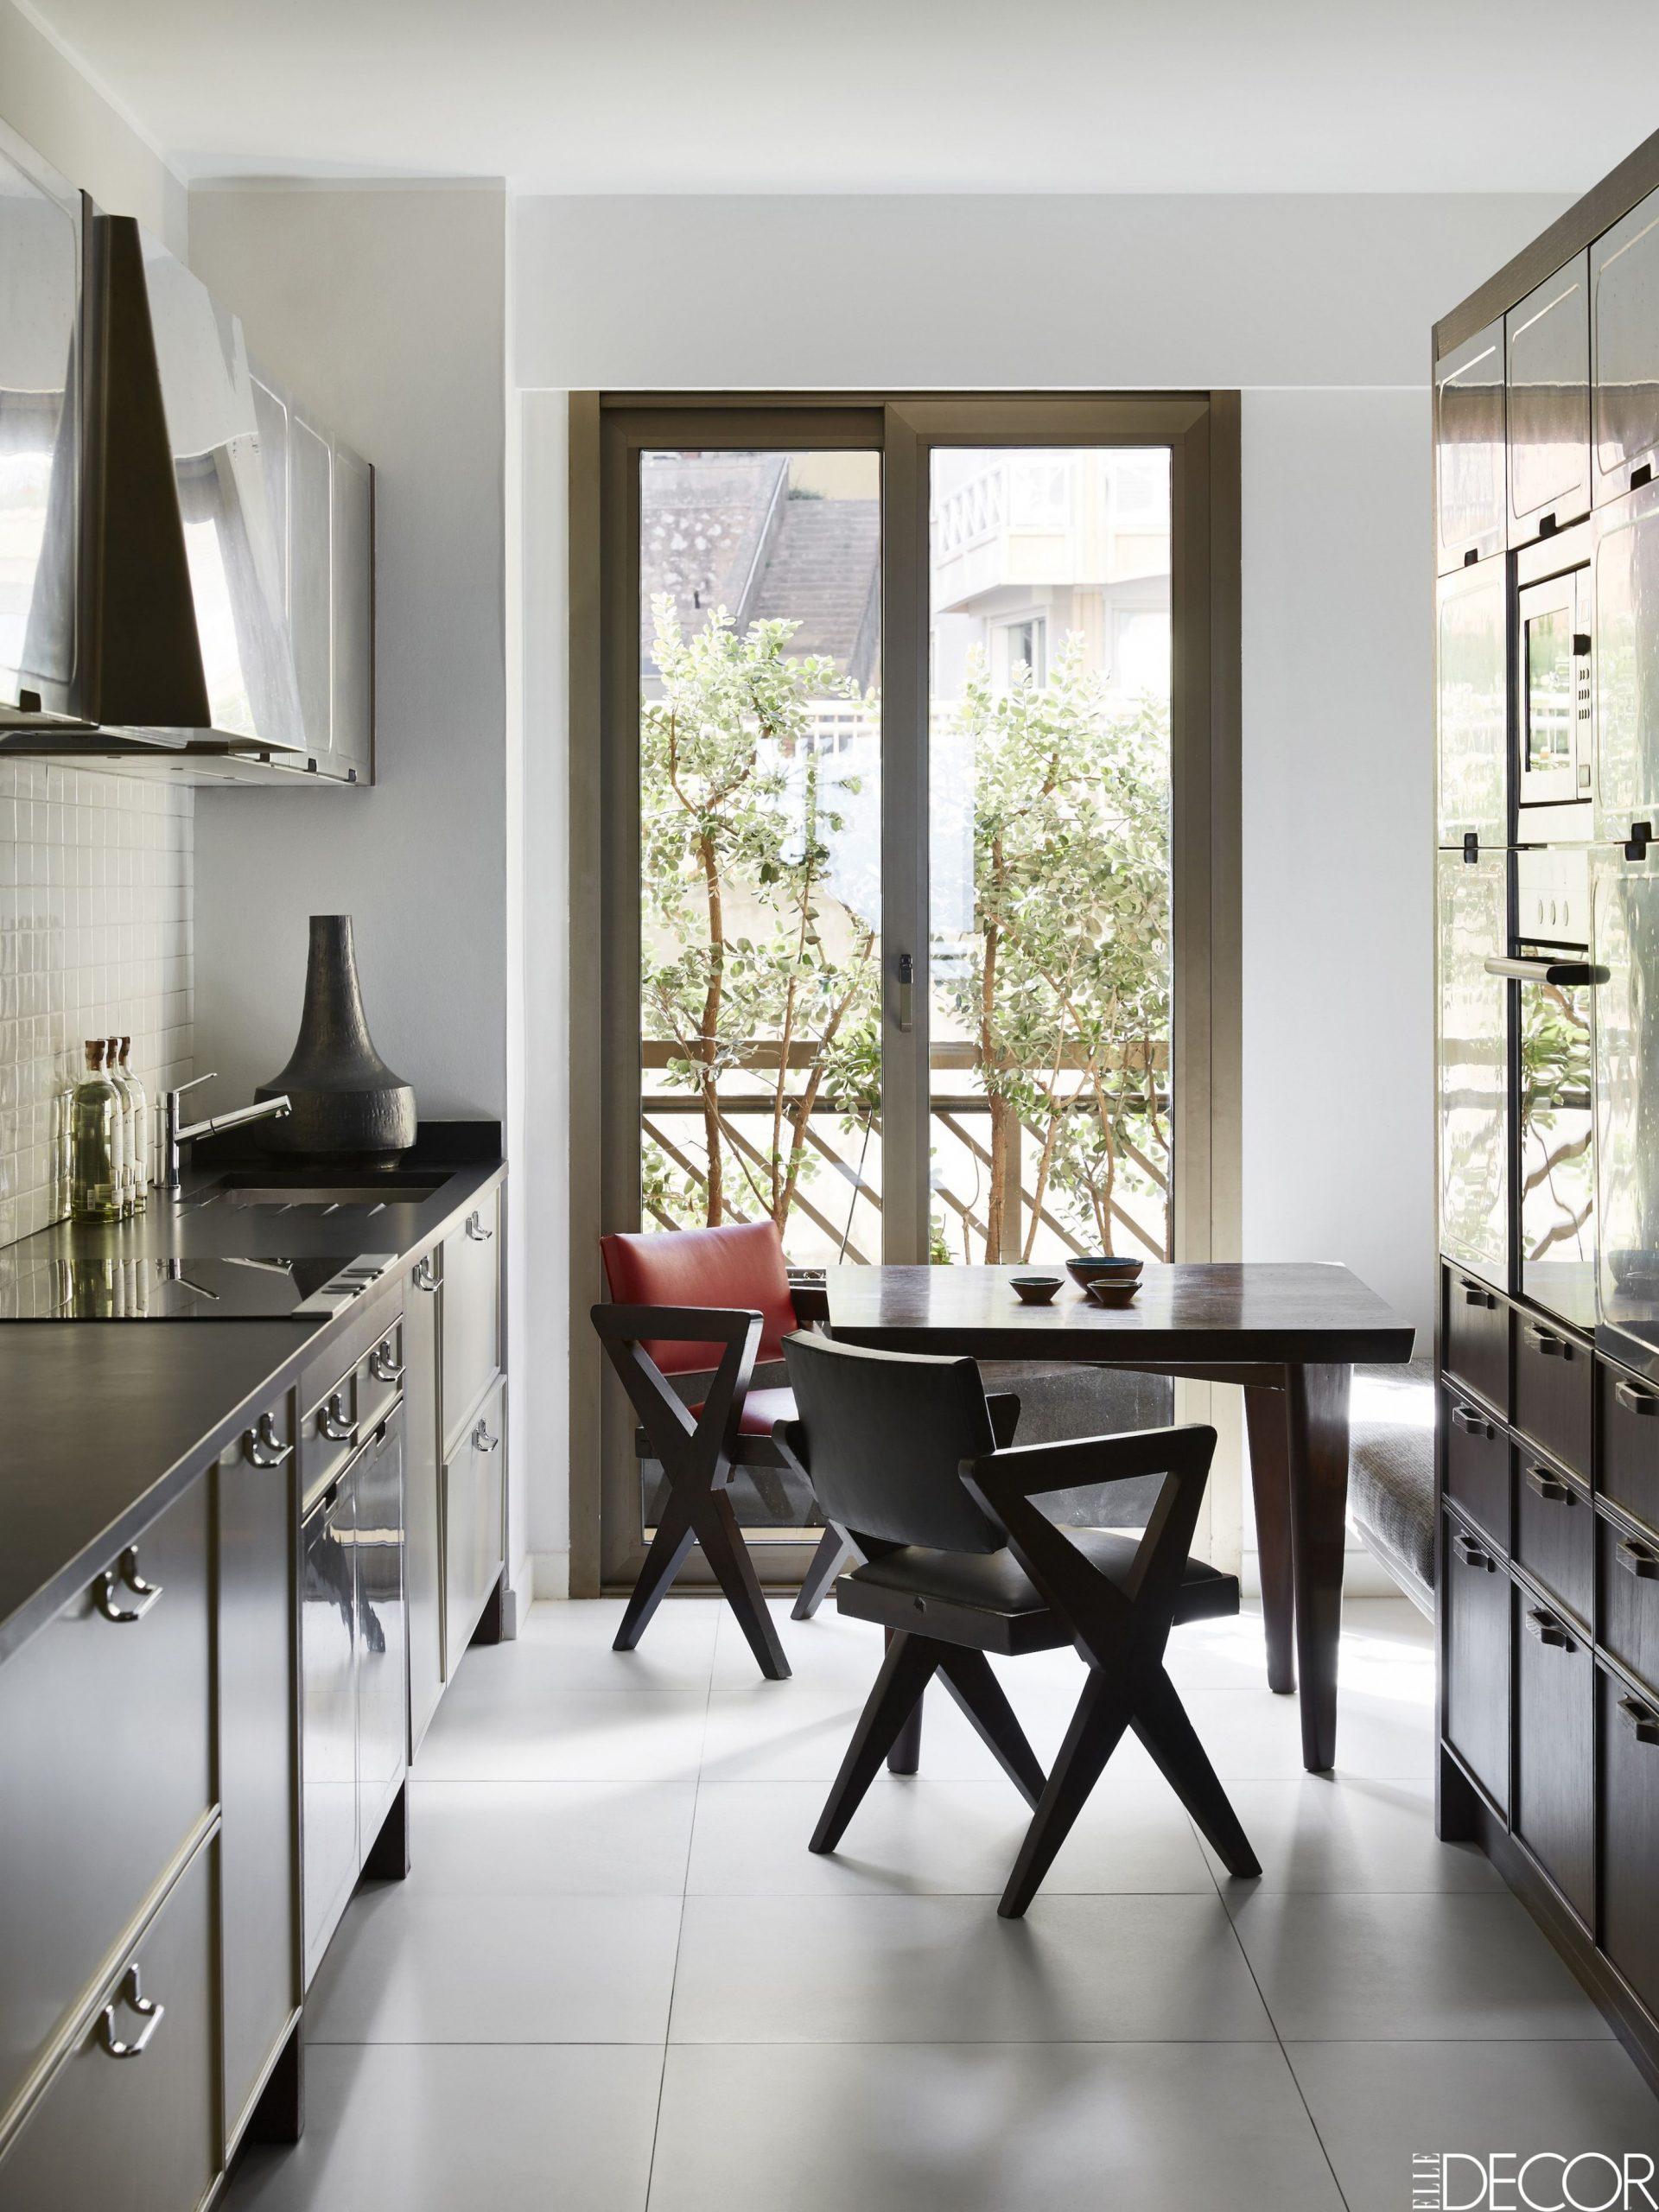 12 Creative Small Kitchen Ideas - Brilliant Small Space Hacks - Small Dining Room Kitchen Ideas